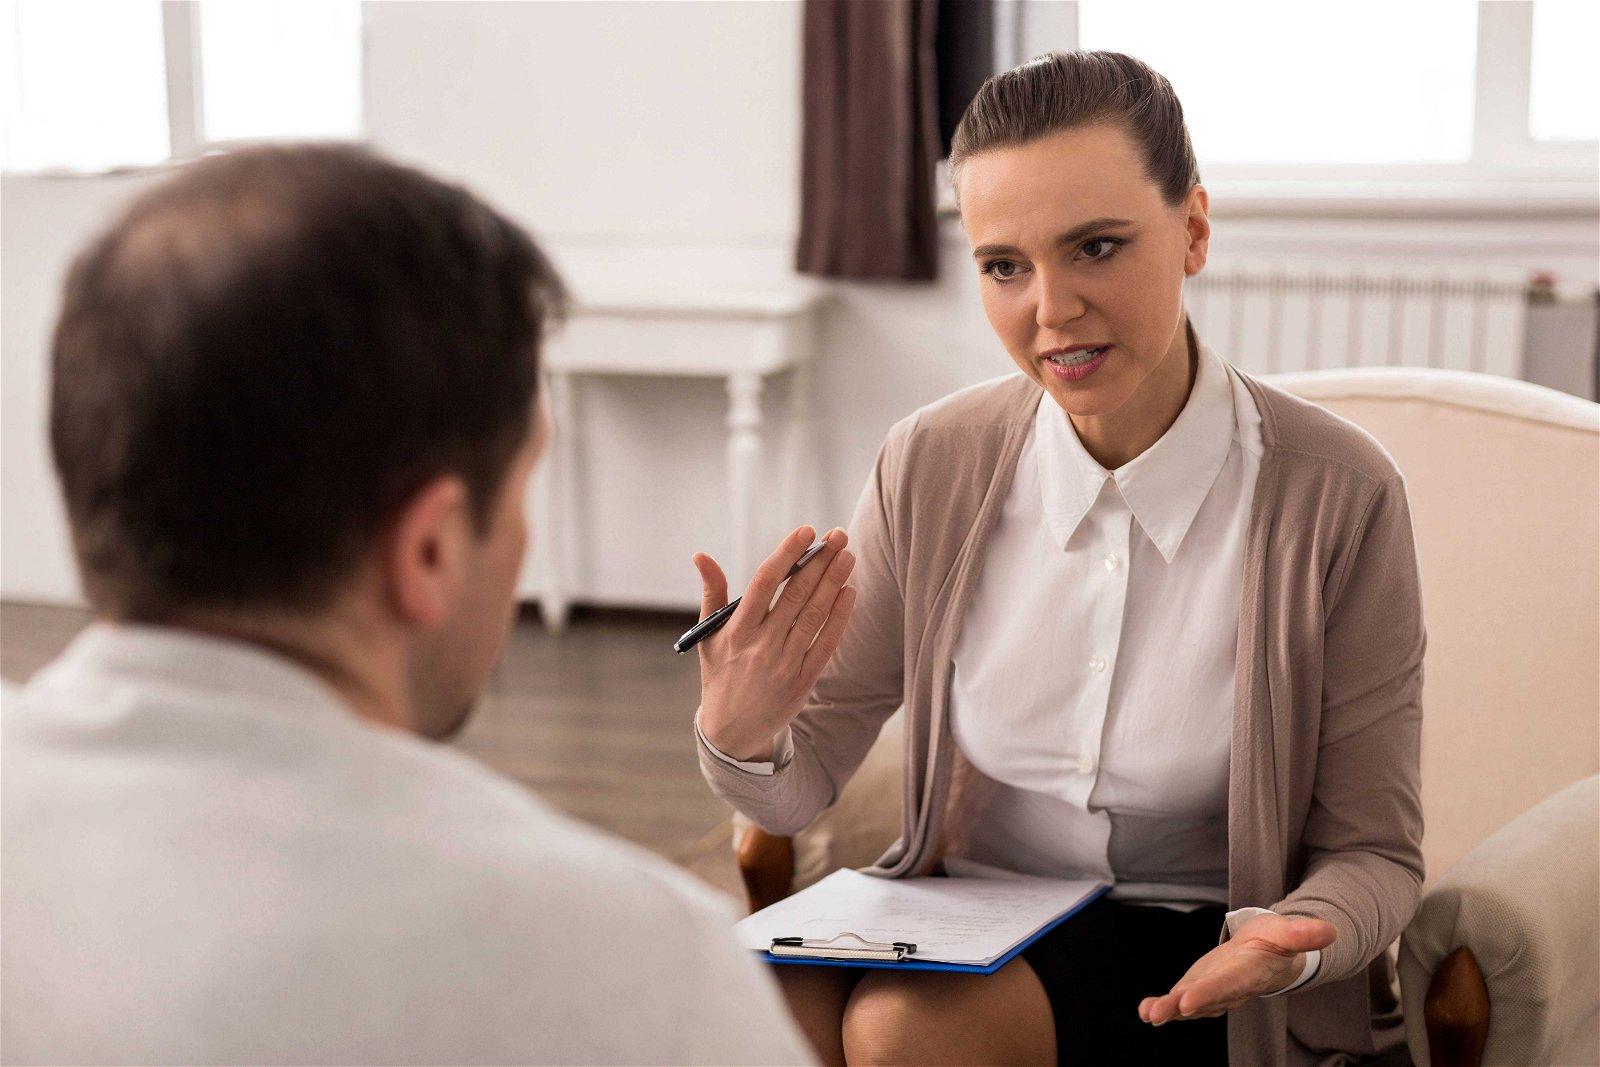 GAF Scores & DSM-V for VA Mental Health Disorder Claims